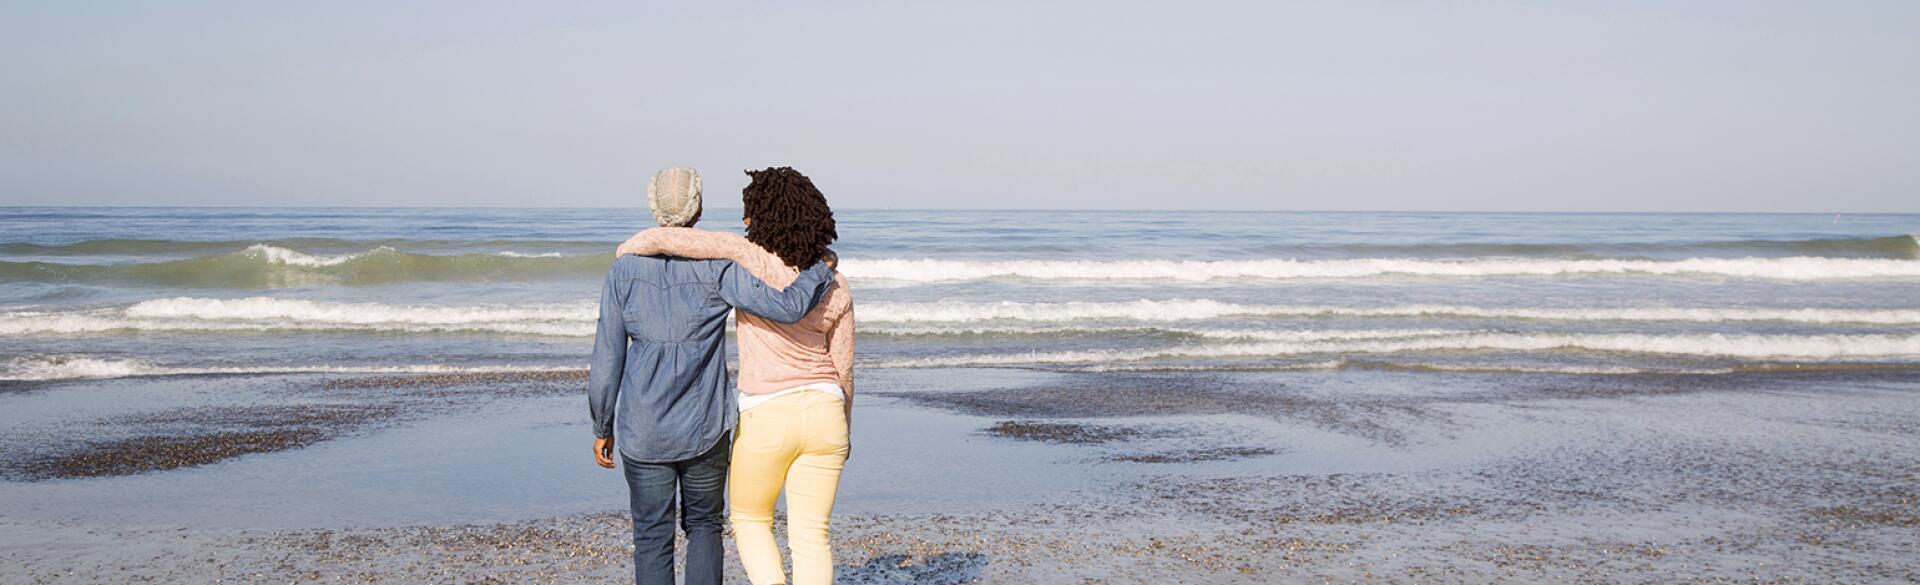 Black women hugging and walking on beach